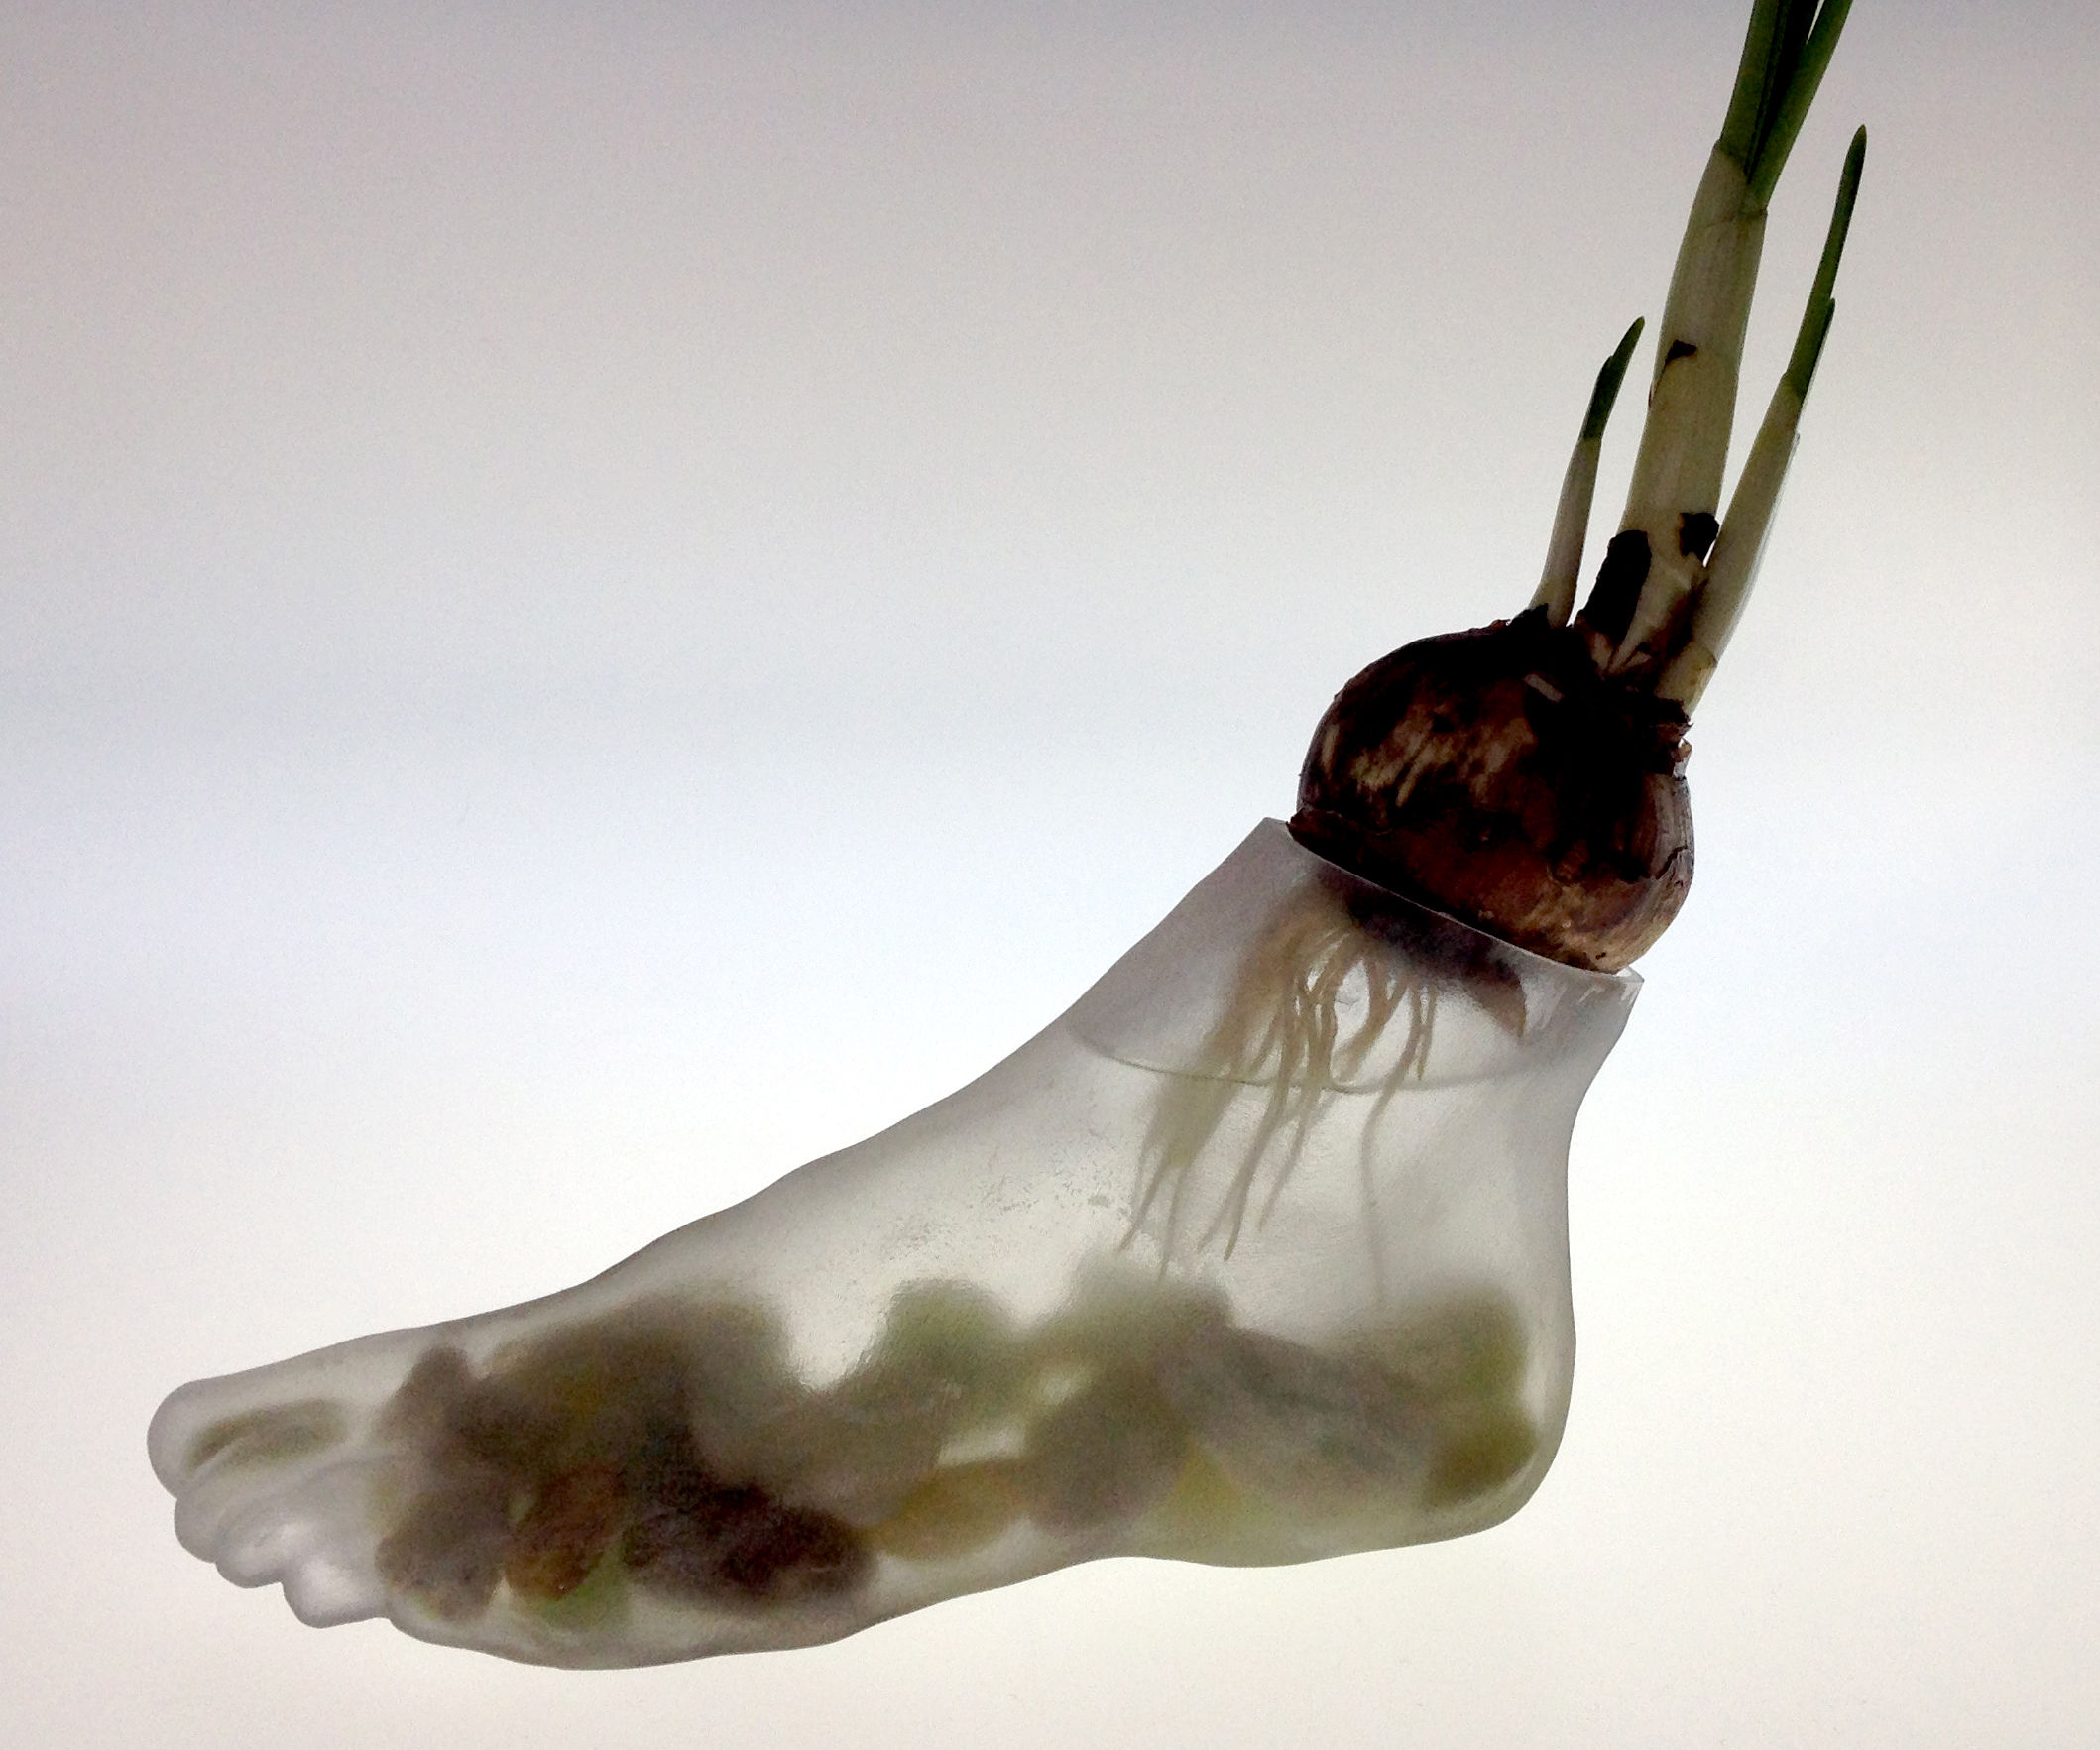 Prosody Flora